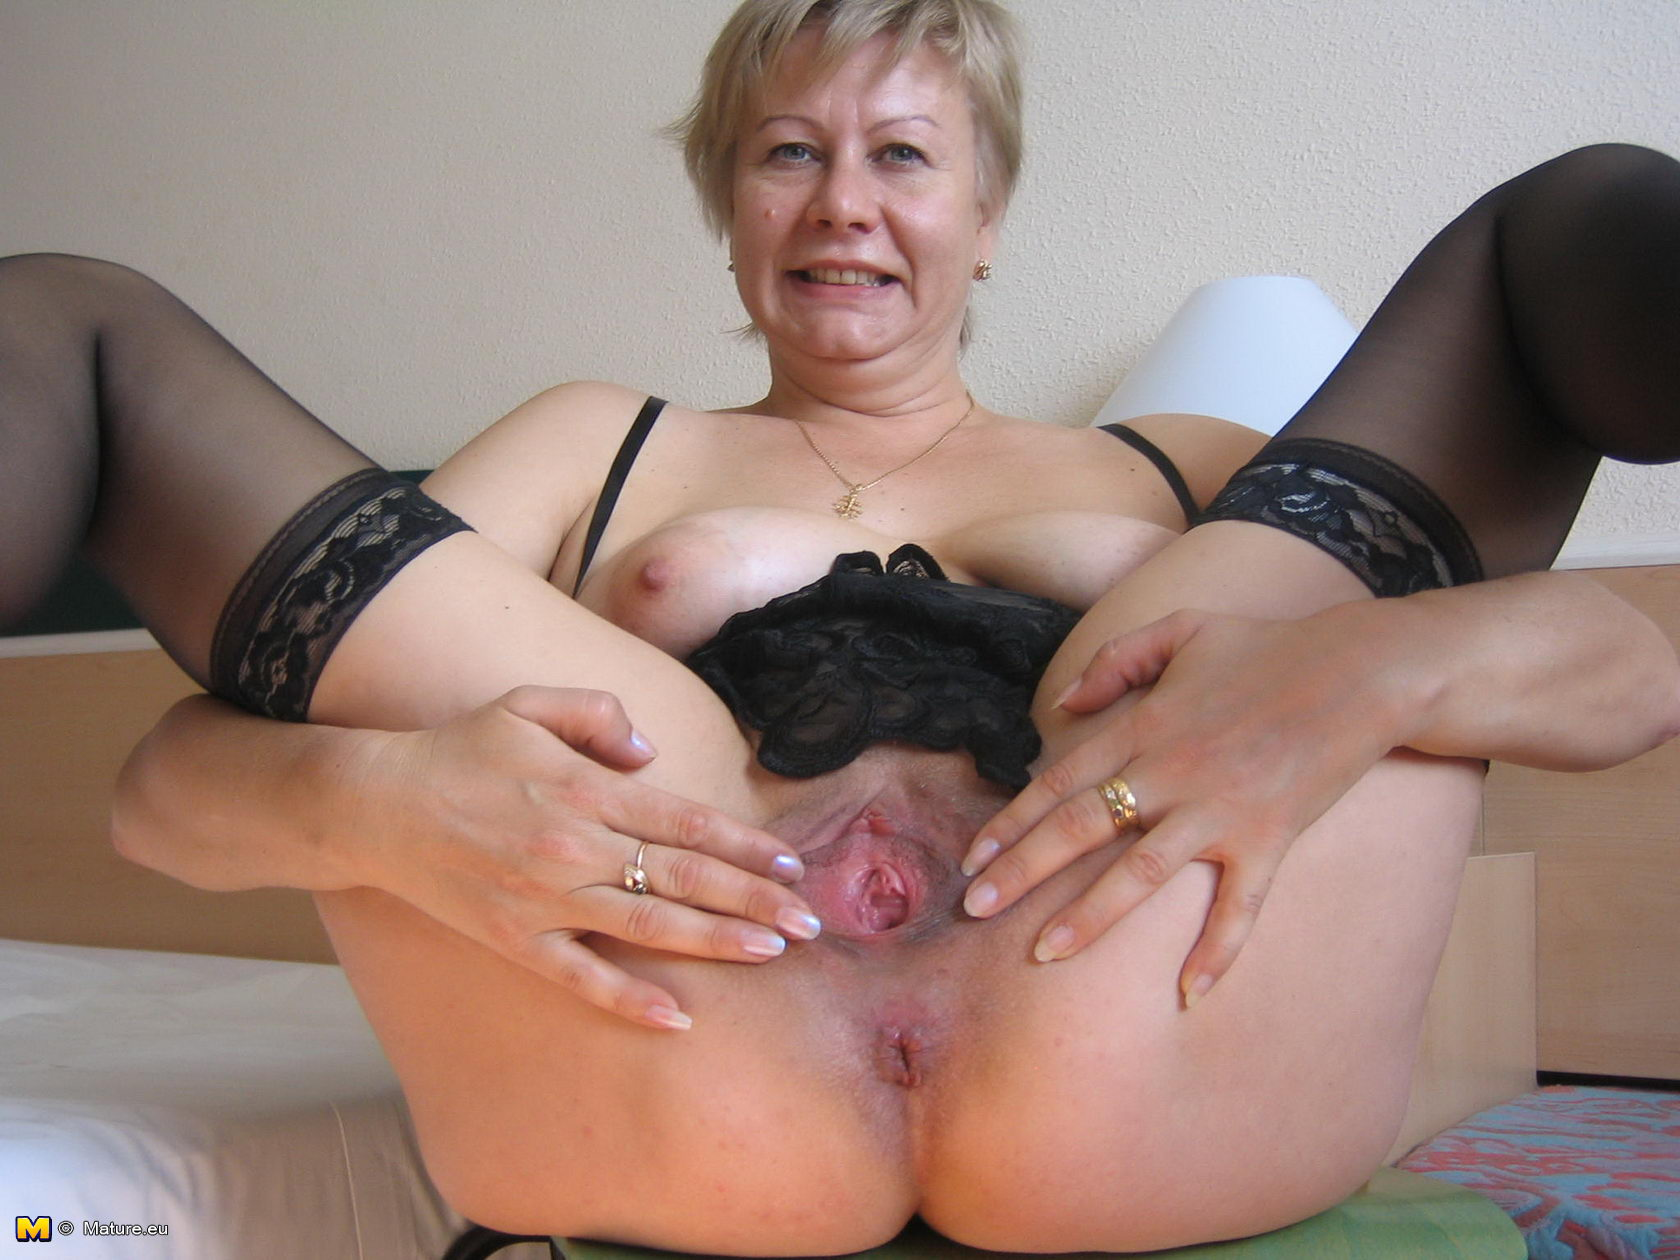 Сын довел зрелую маму до оргазиа смотреть онлайн 14 фотография